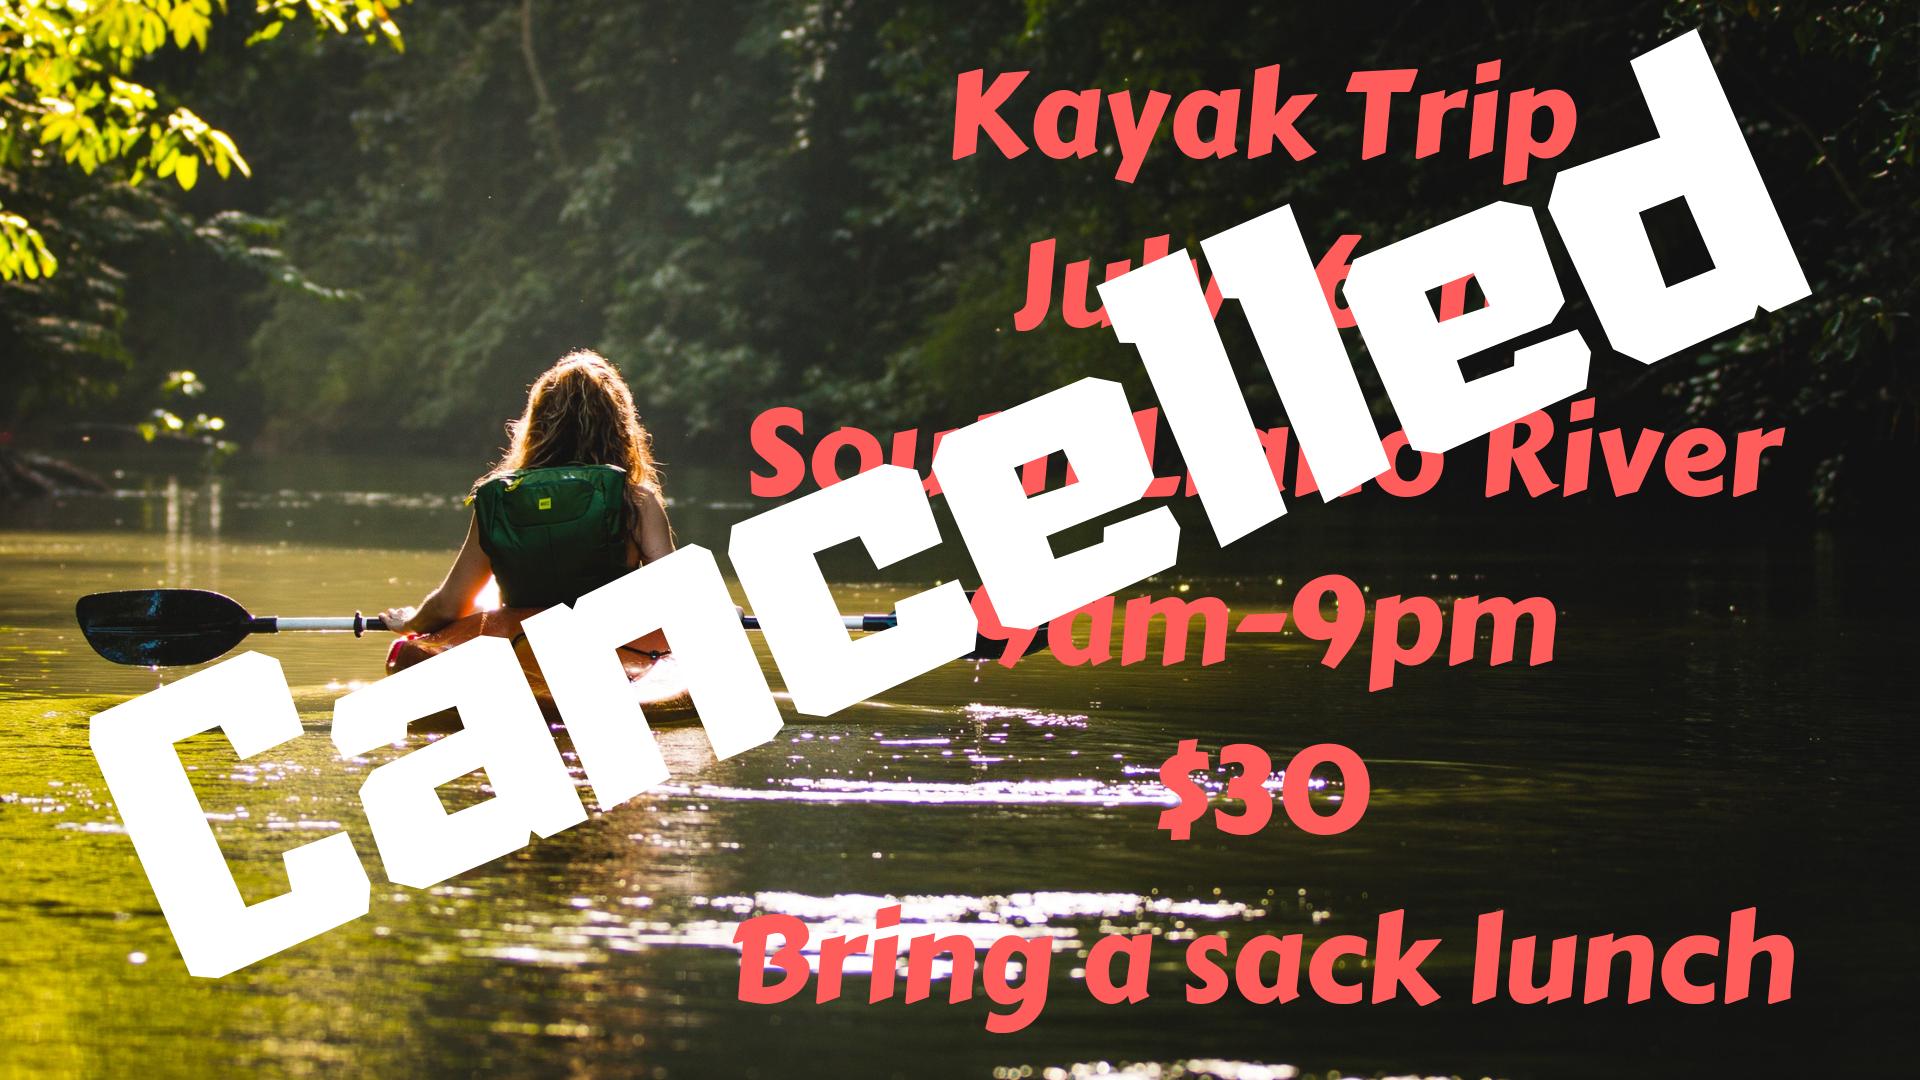 Copy of Kayak Trip 2019.png